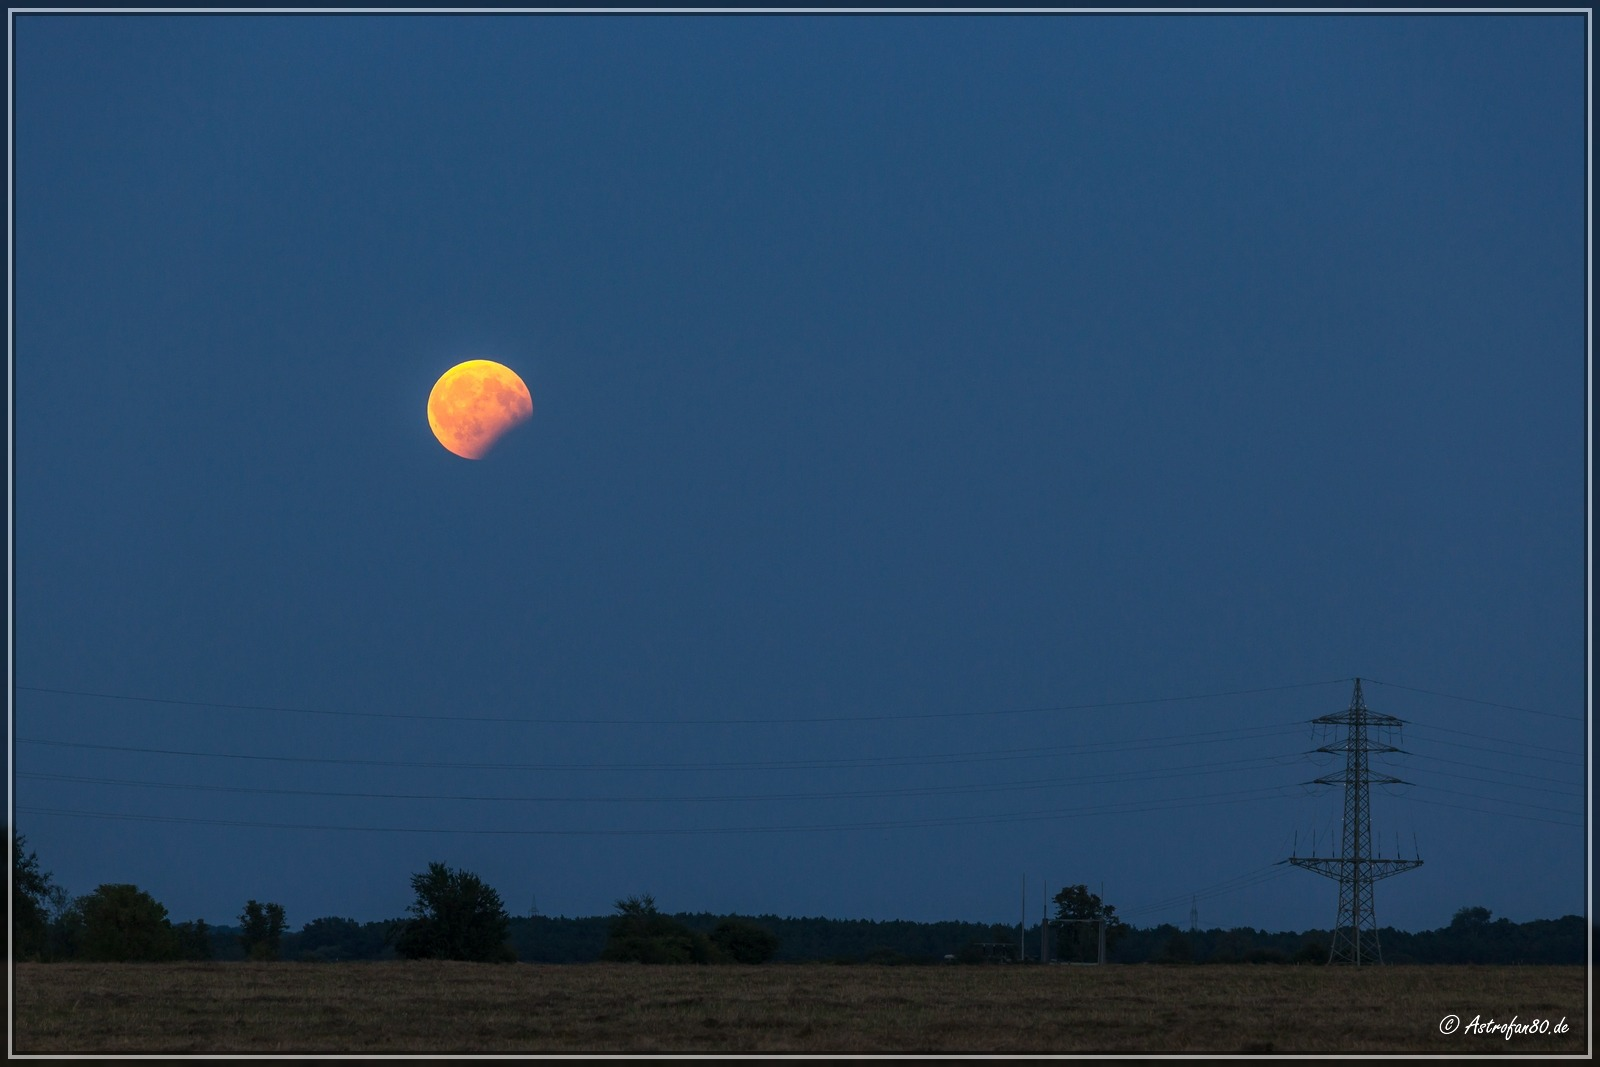 MoFi 170807 - Mond über dem Umspannwerk